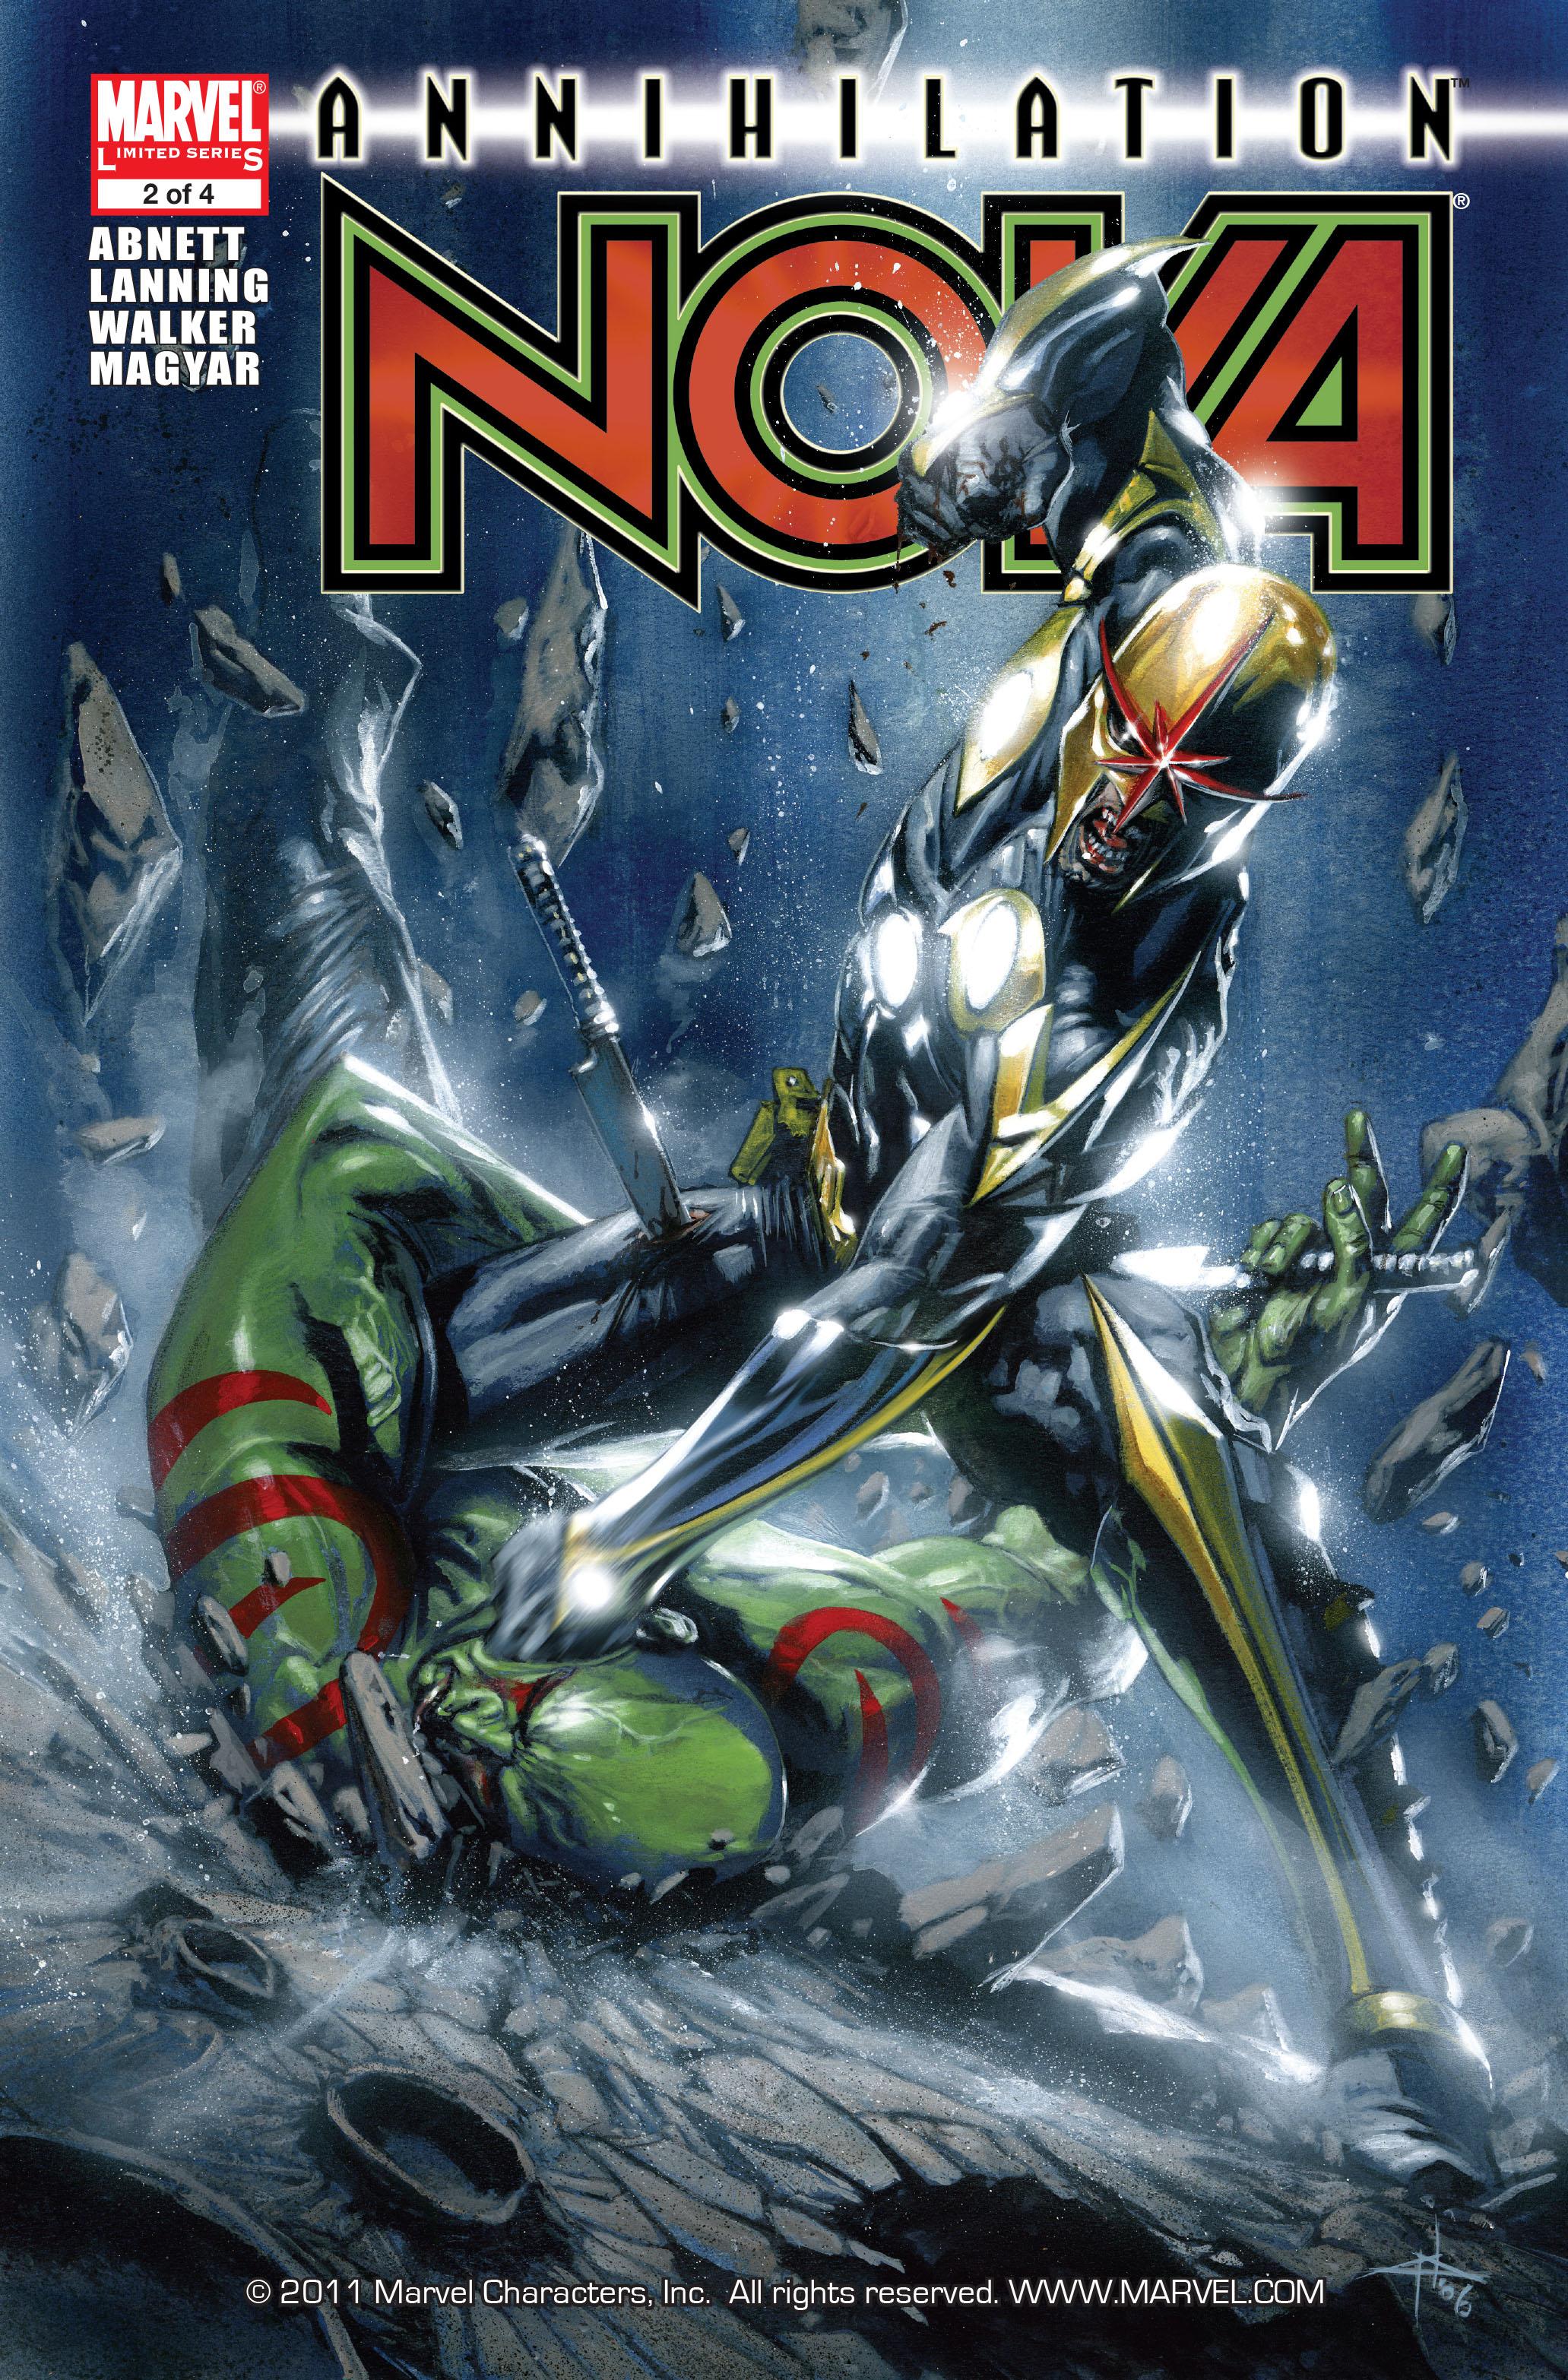 Read online Annihilation: Nova comic -  Issue #2 - 1